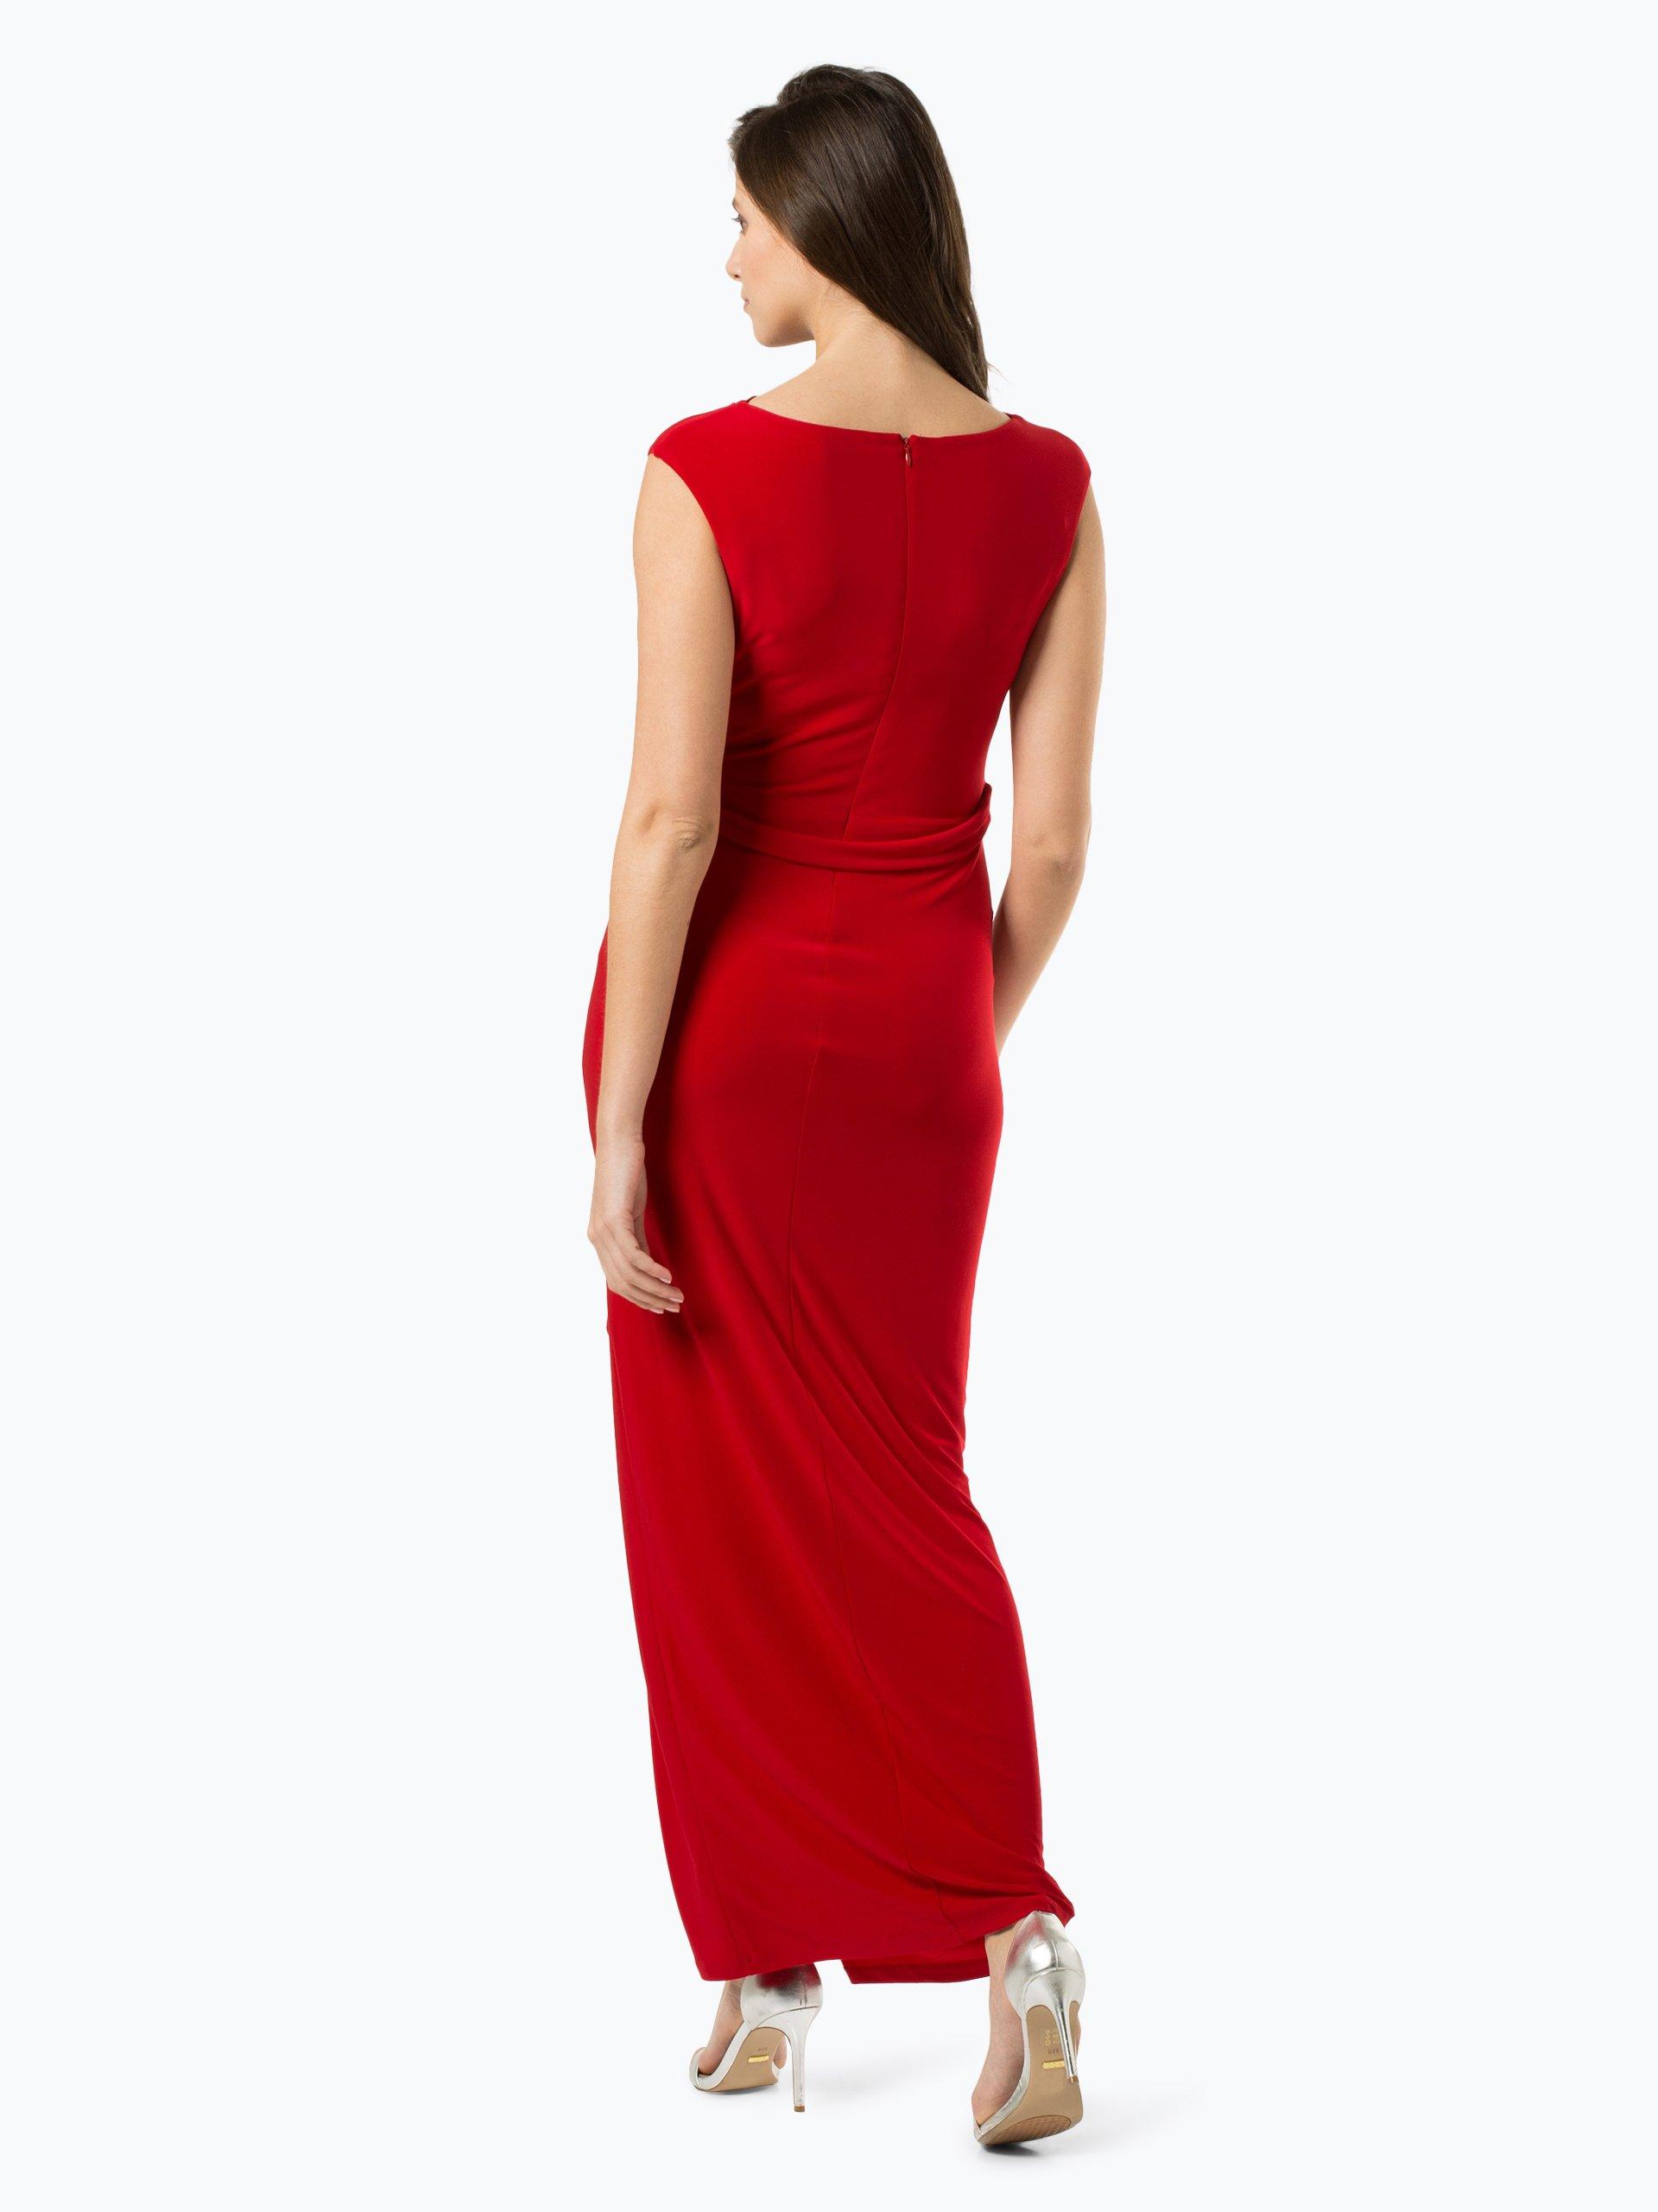 LAUREN RALPH LAUREN Damska sukienka wieczorowa – Shayla